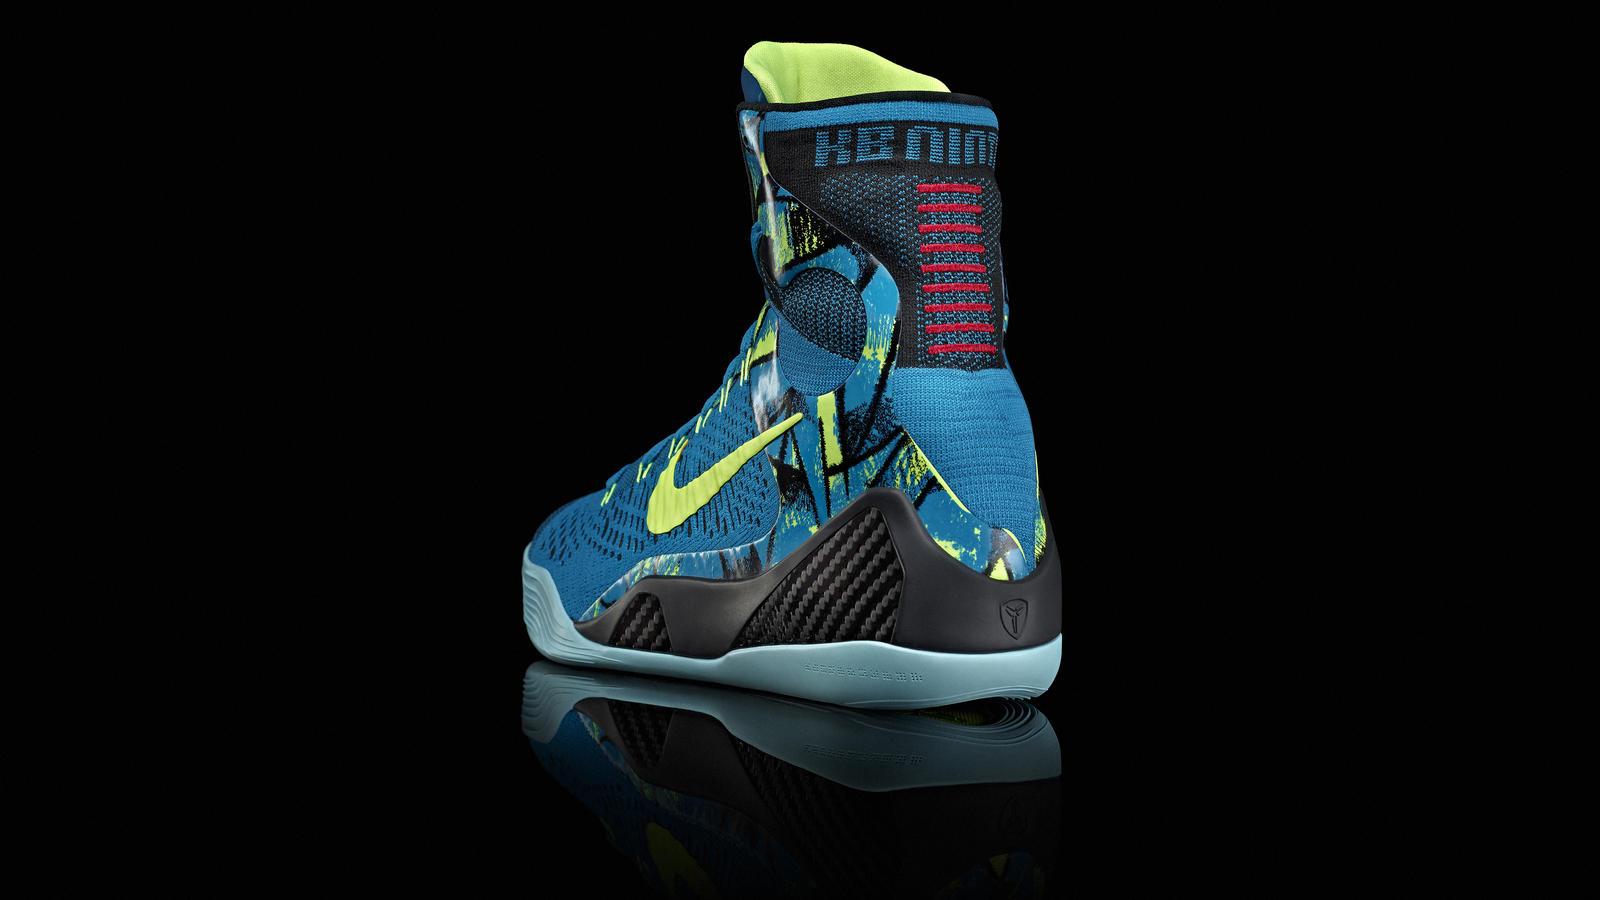 Triple Threat: New KOBE 9 Elite Colorways - Nike News